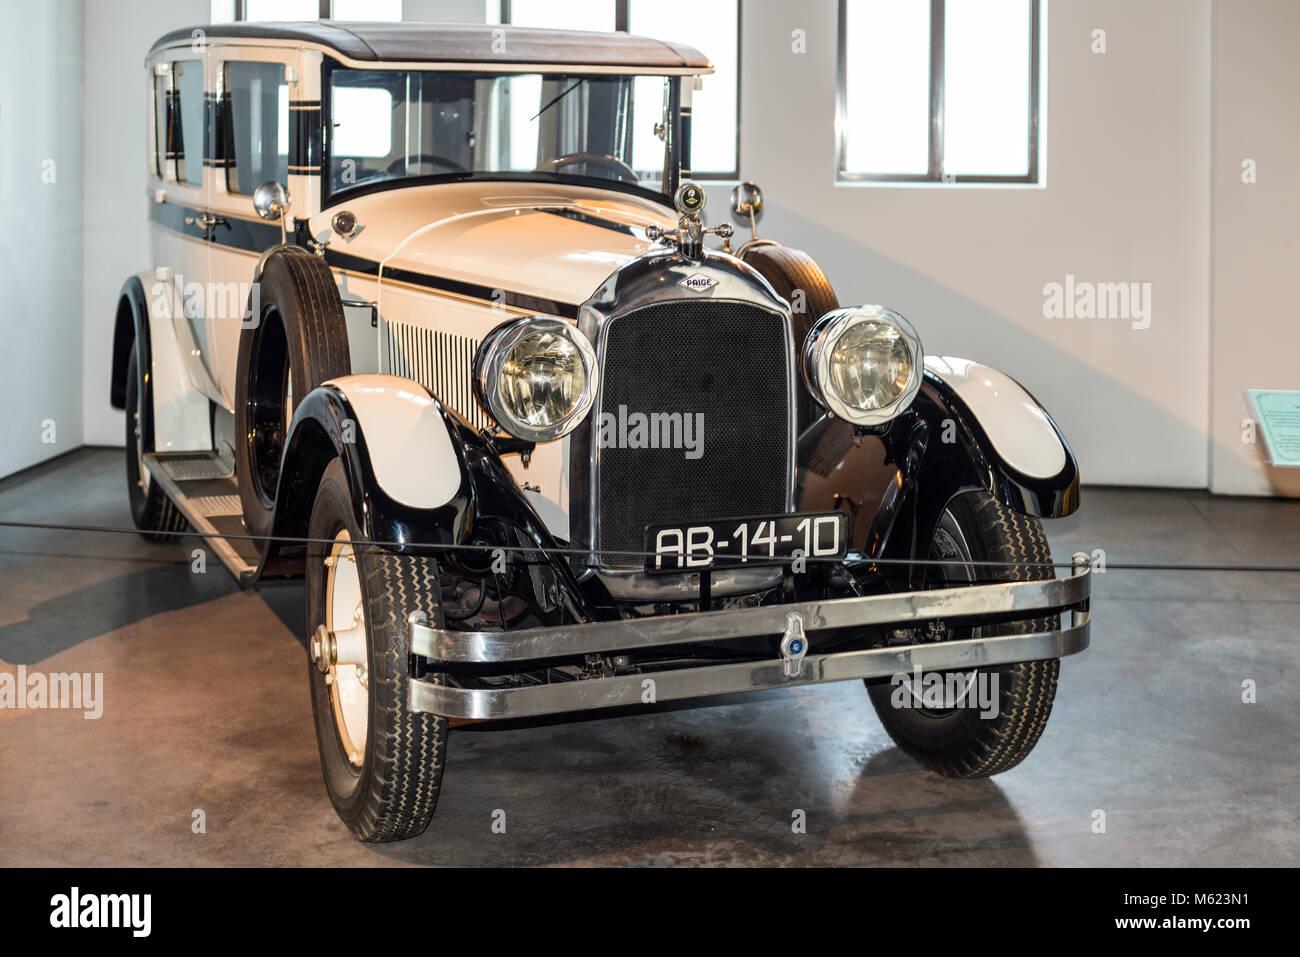 Malaga, Spain - December 7, 2016: Vintage 1927 Cavalier Graham-Paige USA car displayed at Malaga Automobile and - Stock Image